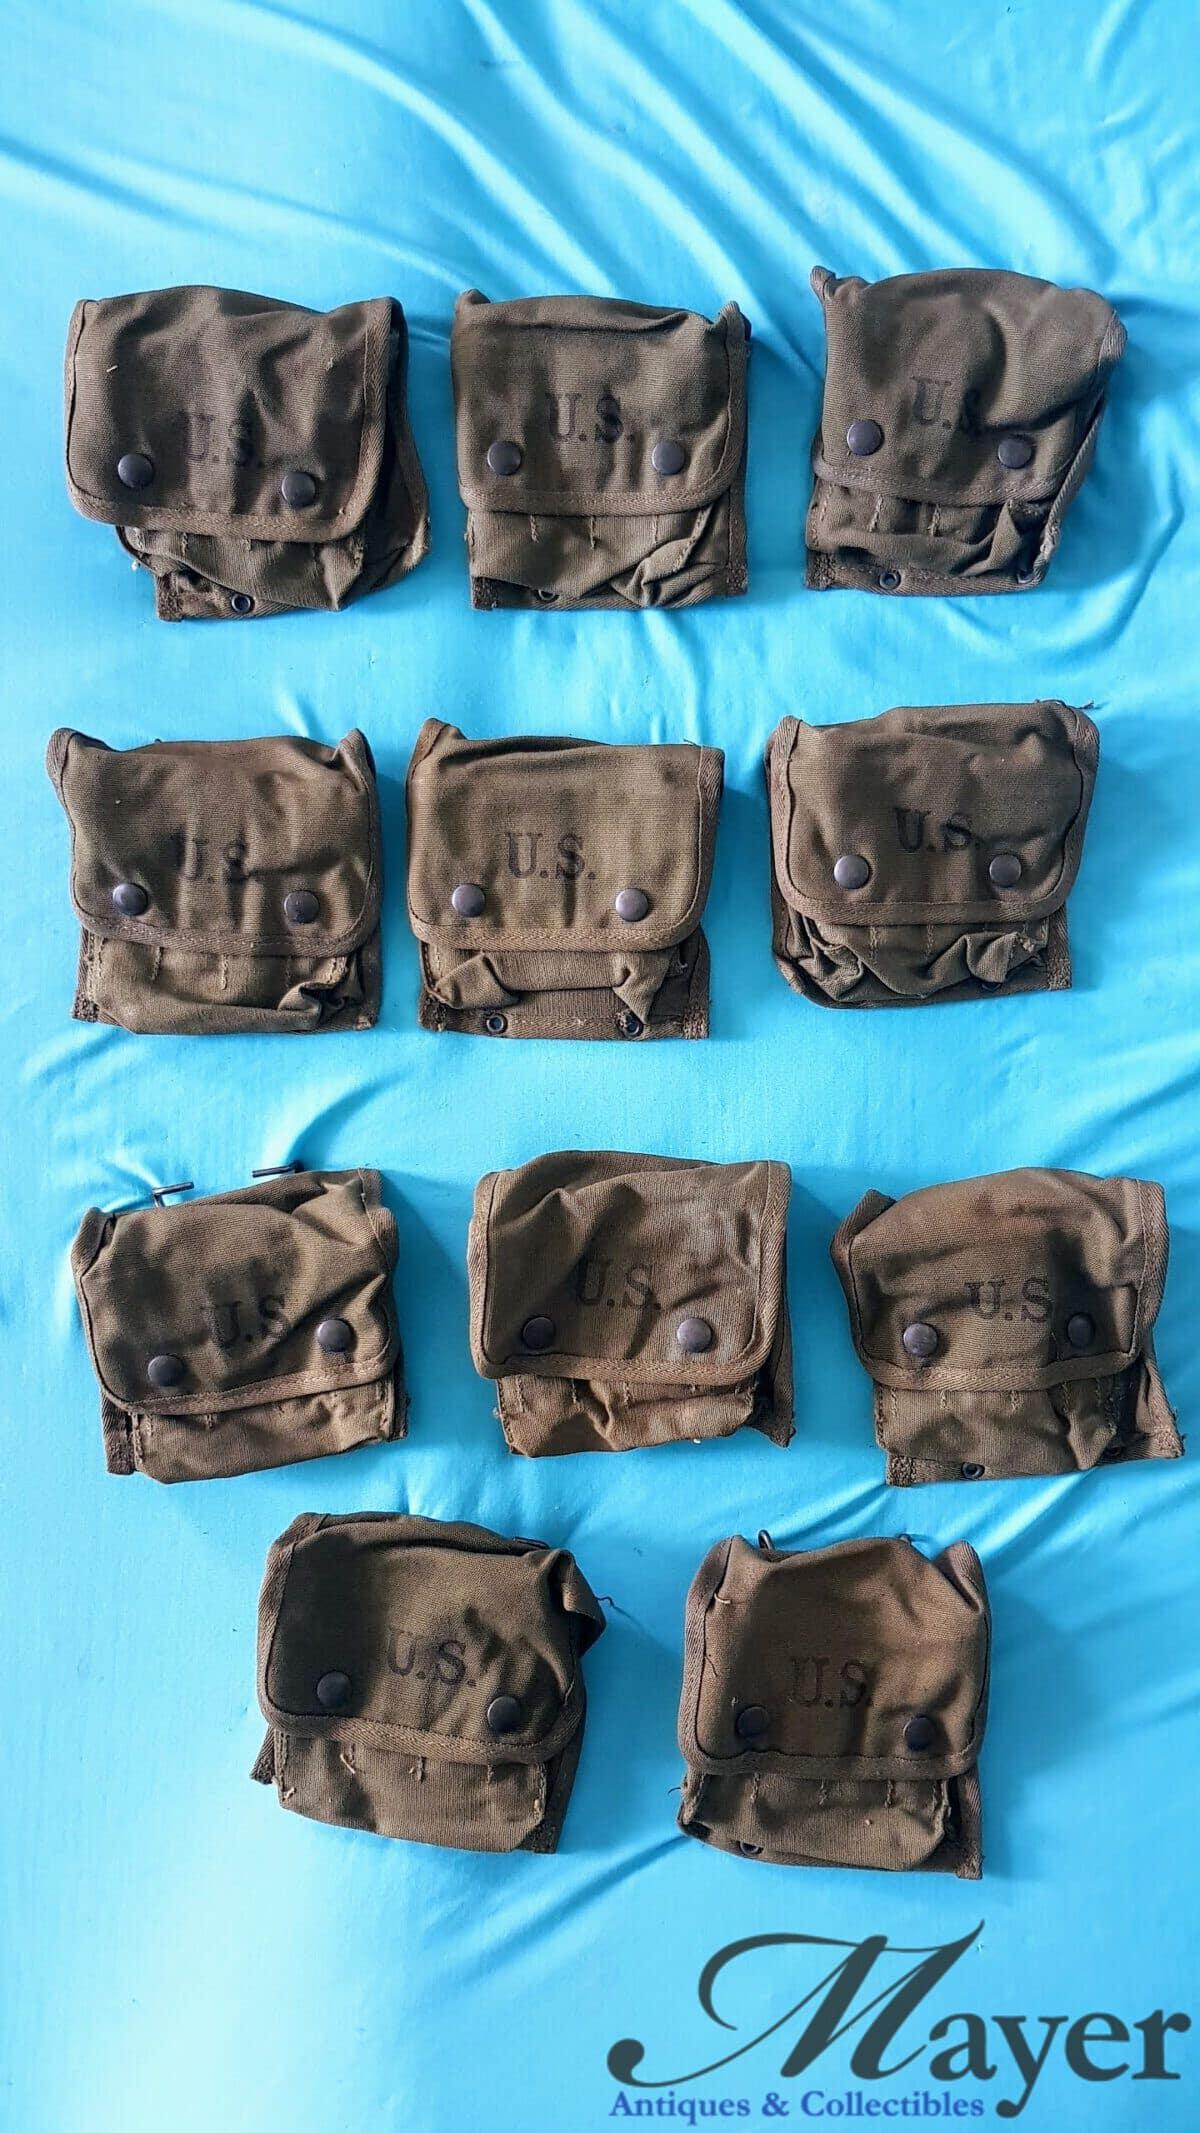 US Army WW2 M2 First Aid Kit Pouch